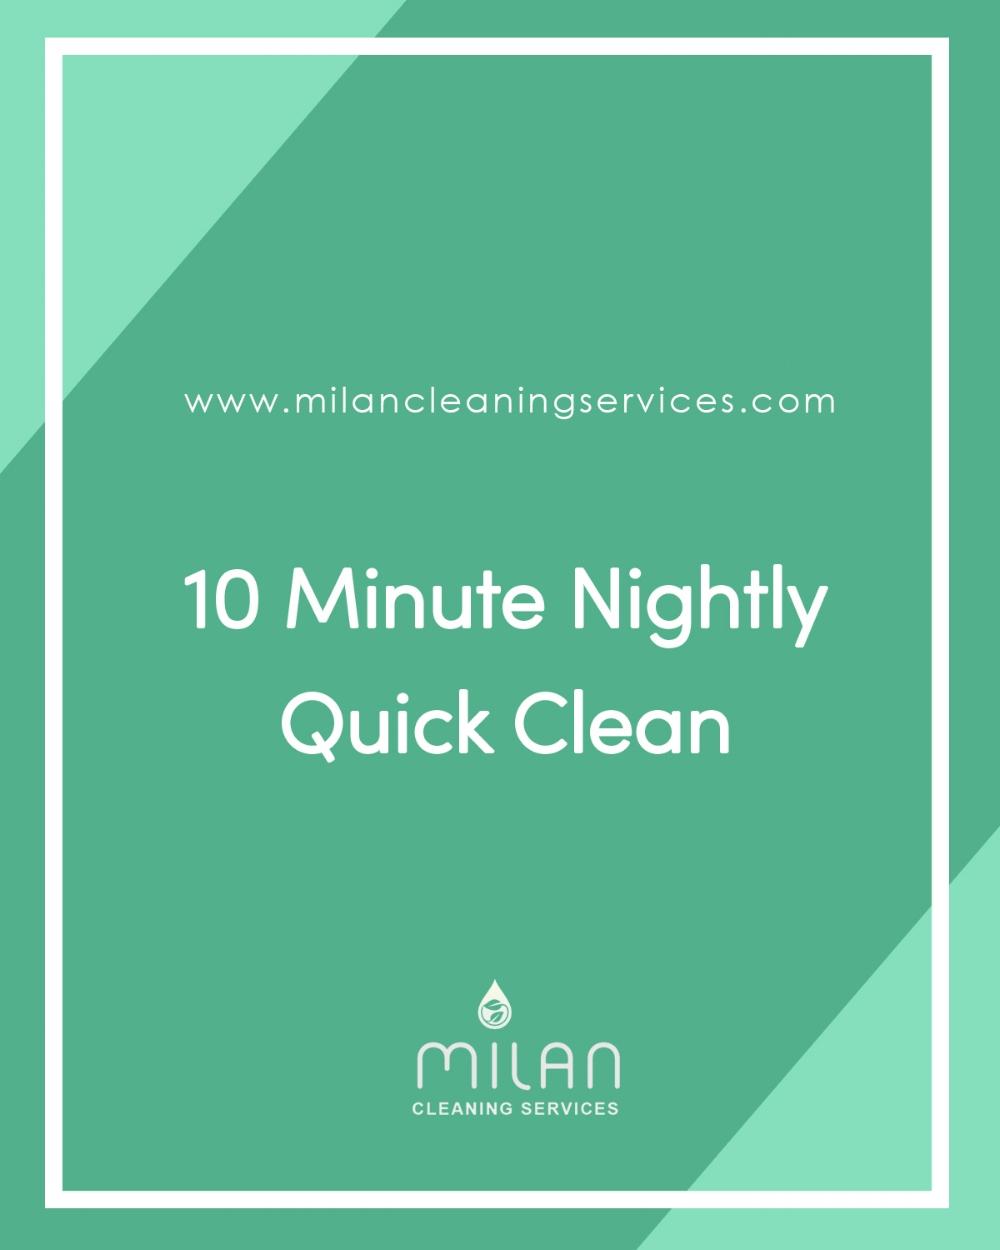 10-minute-quick-clean.jpg